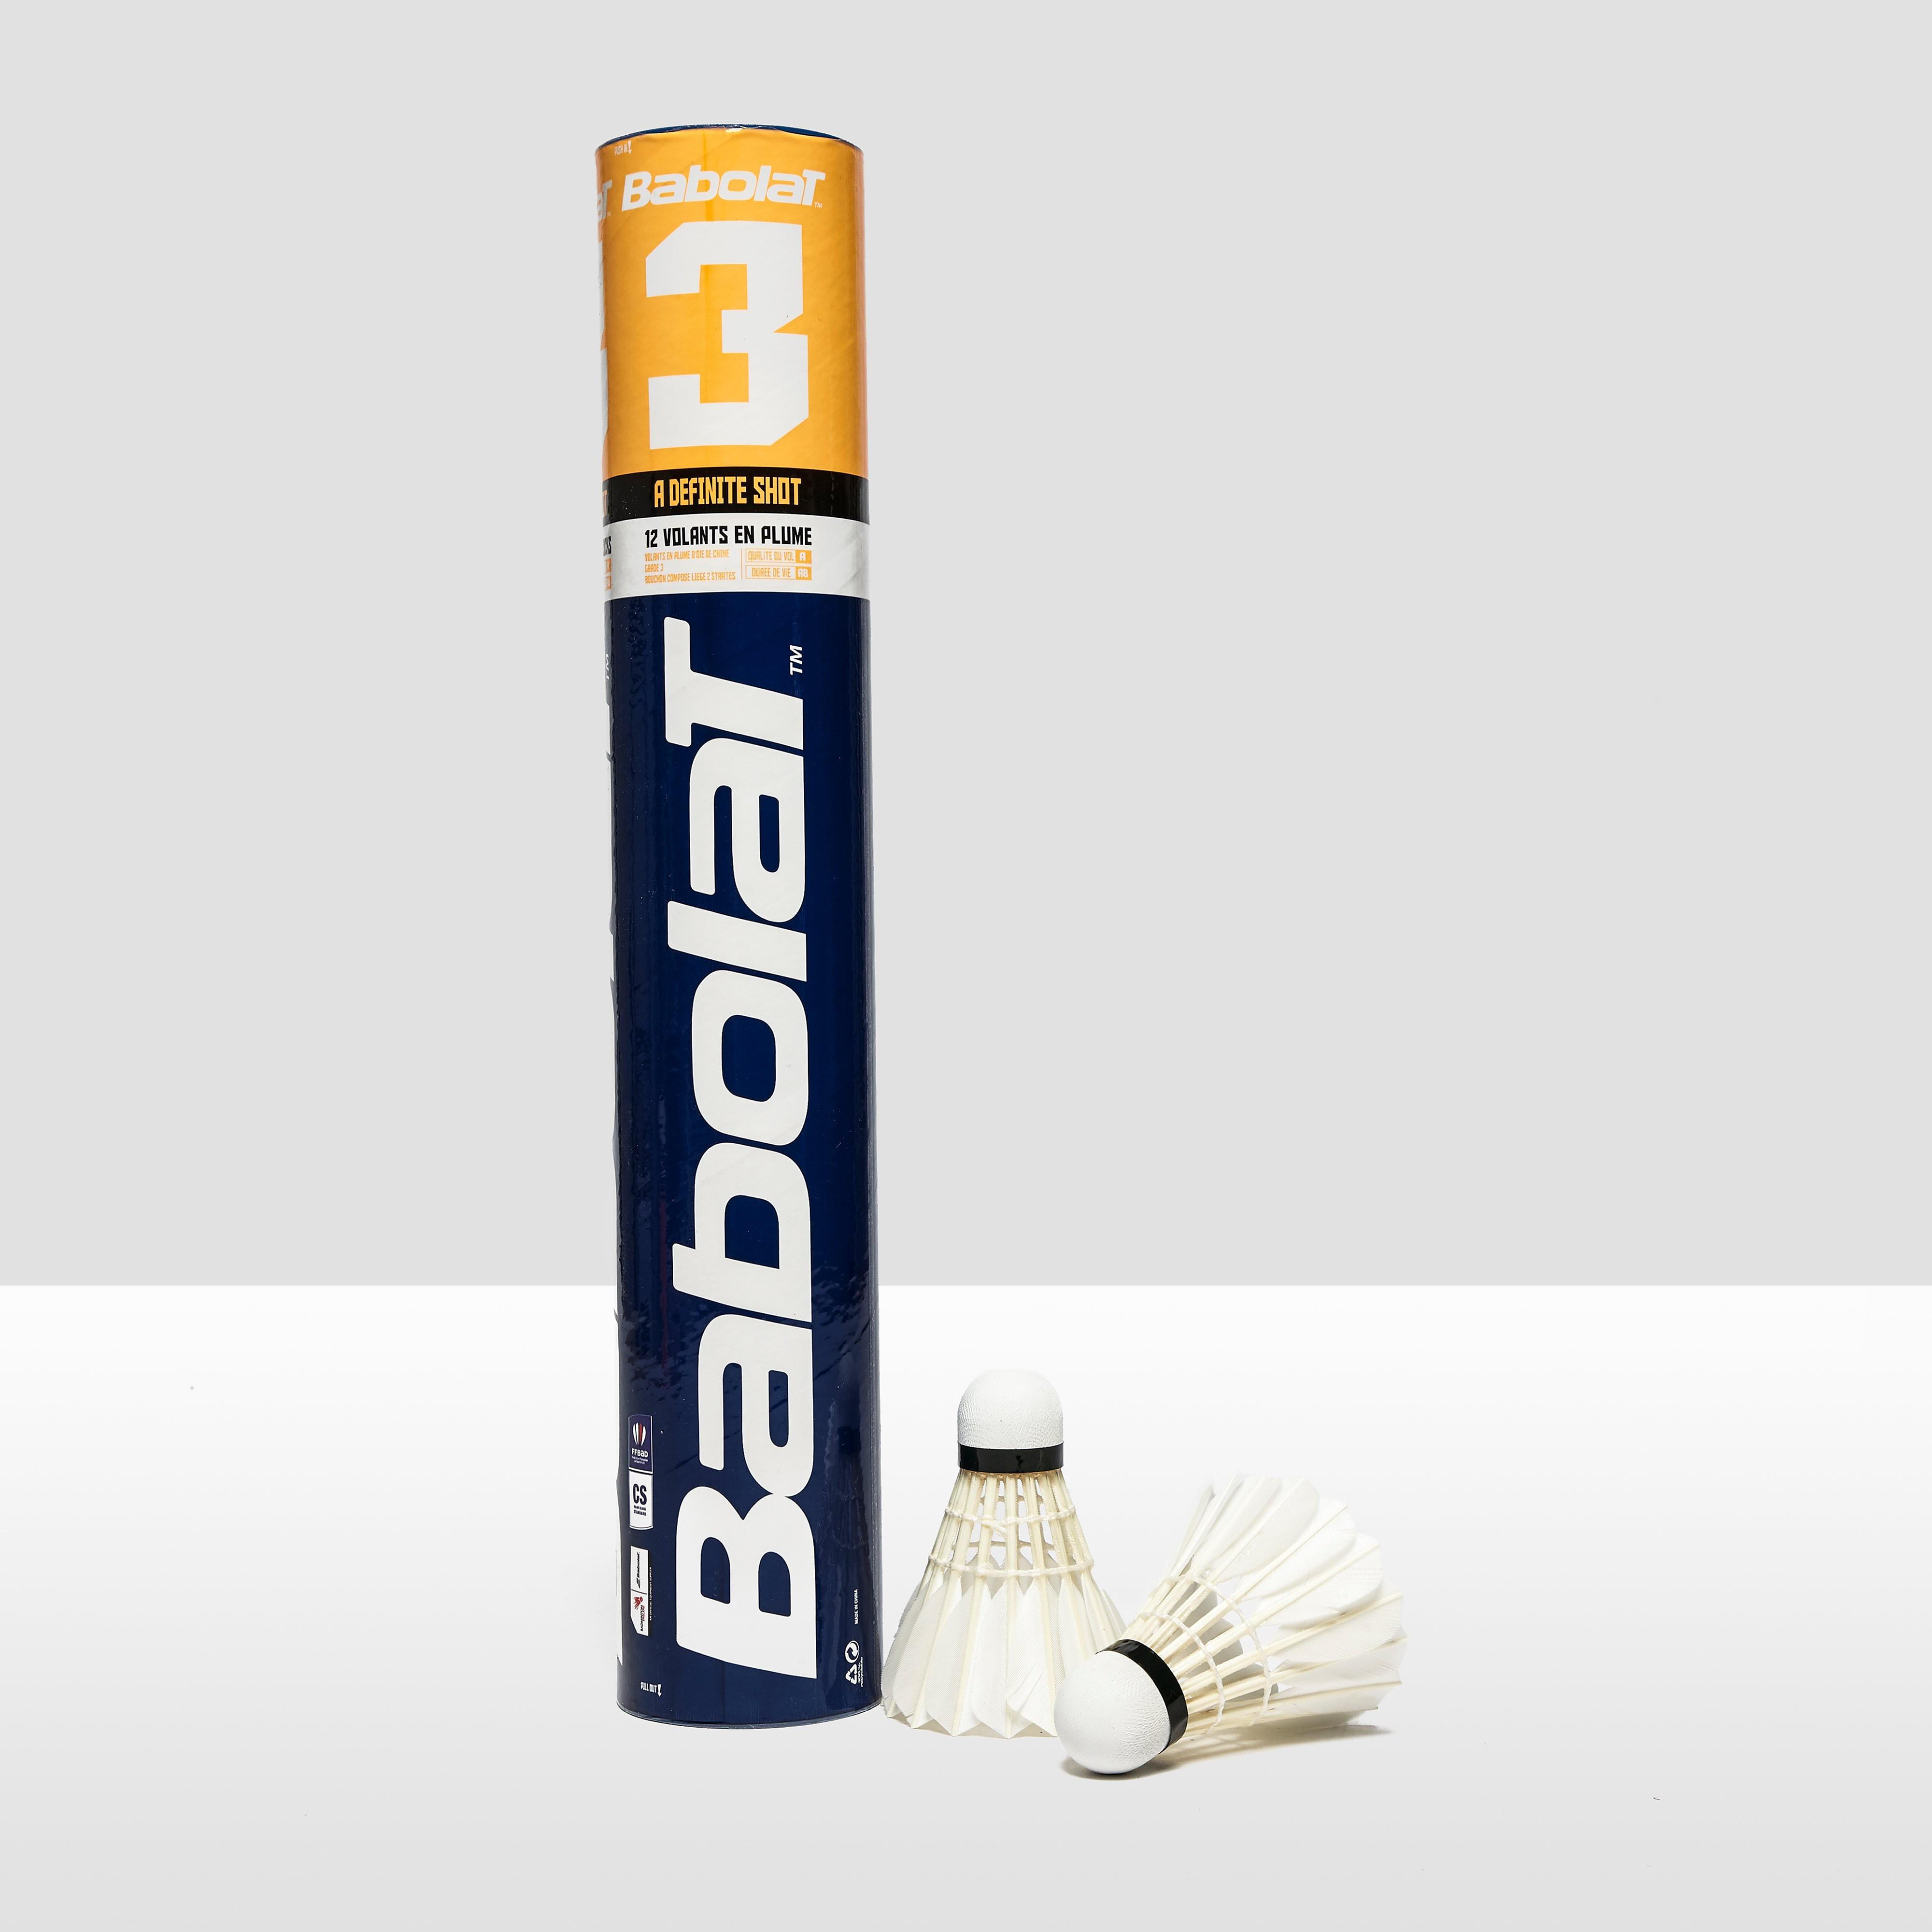 Babolat 3 Feather Badminton Shuttles